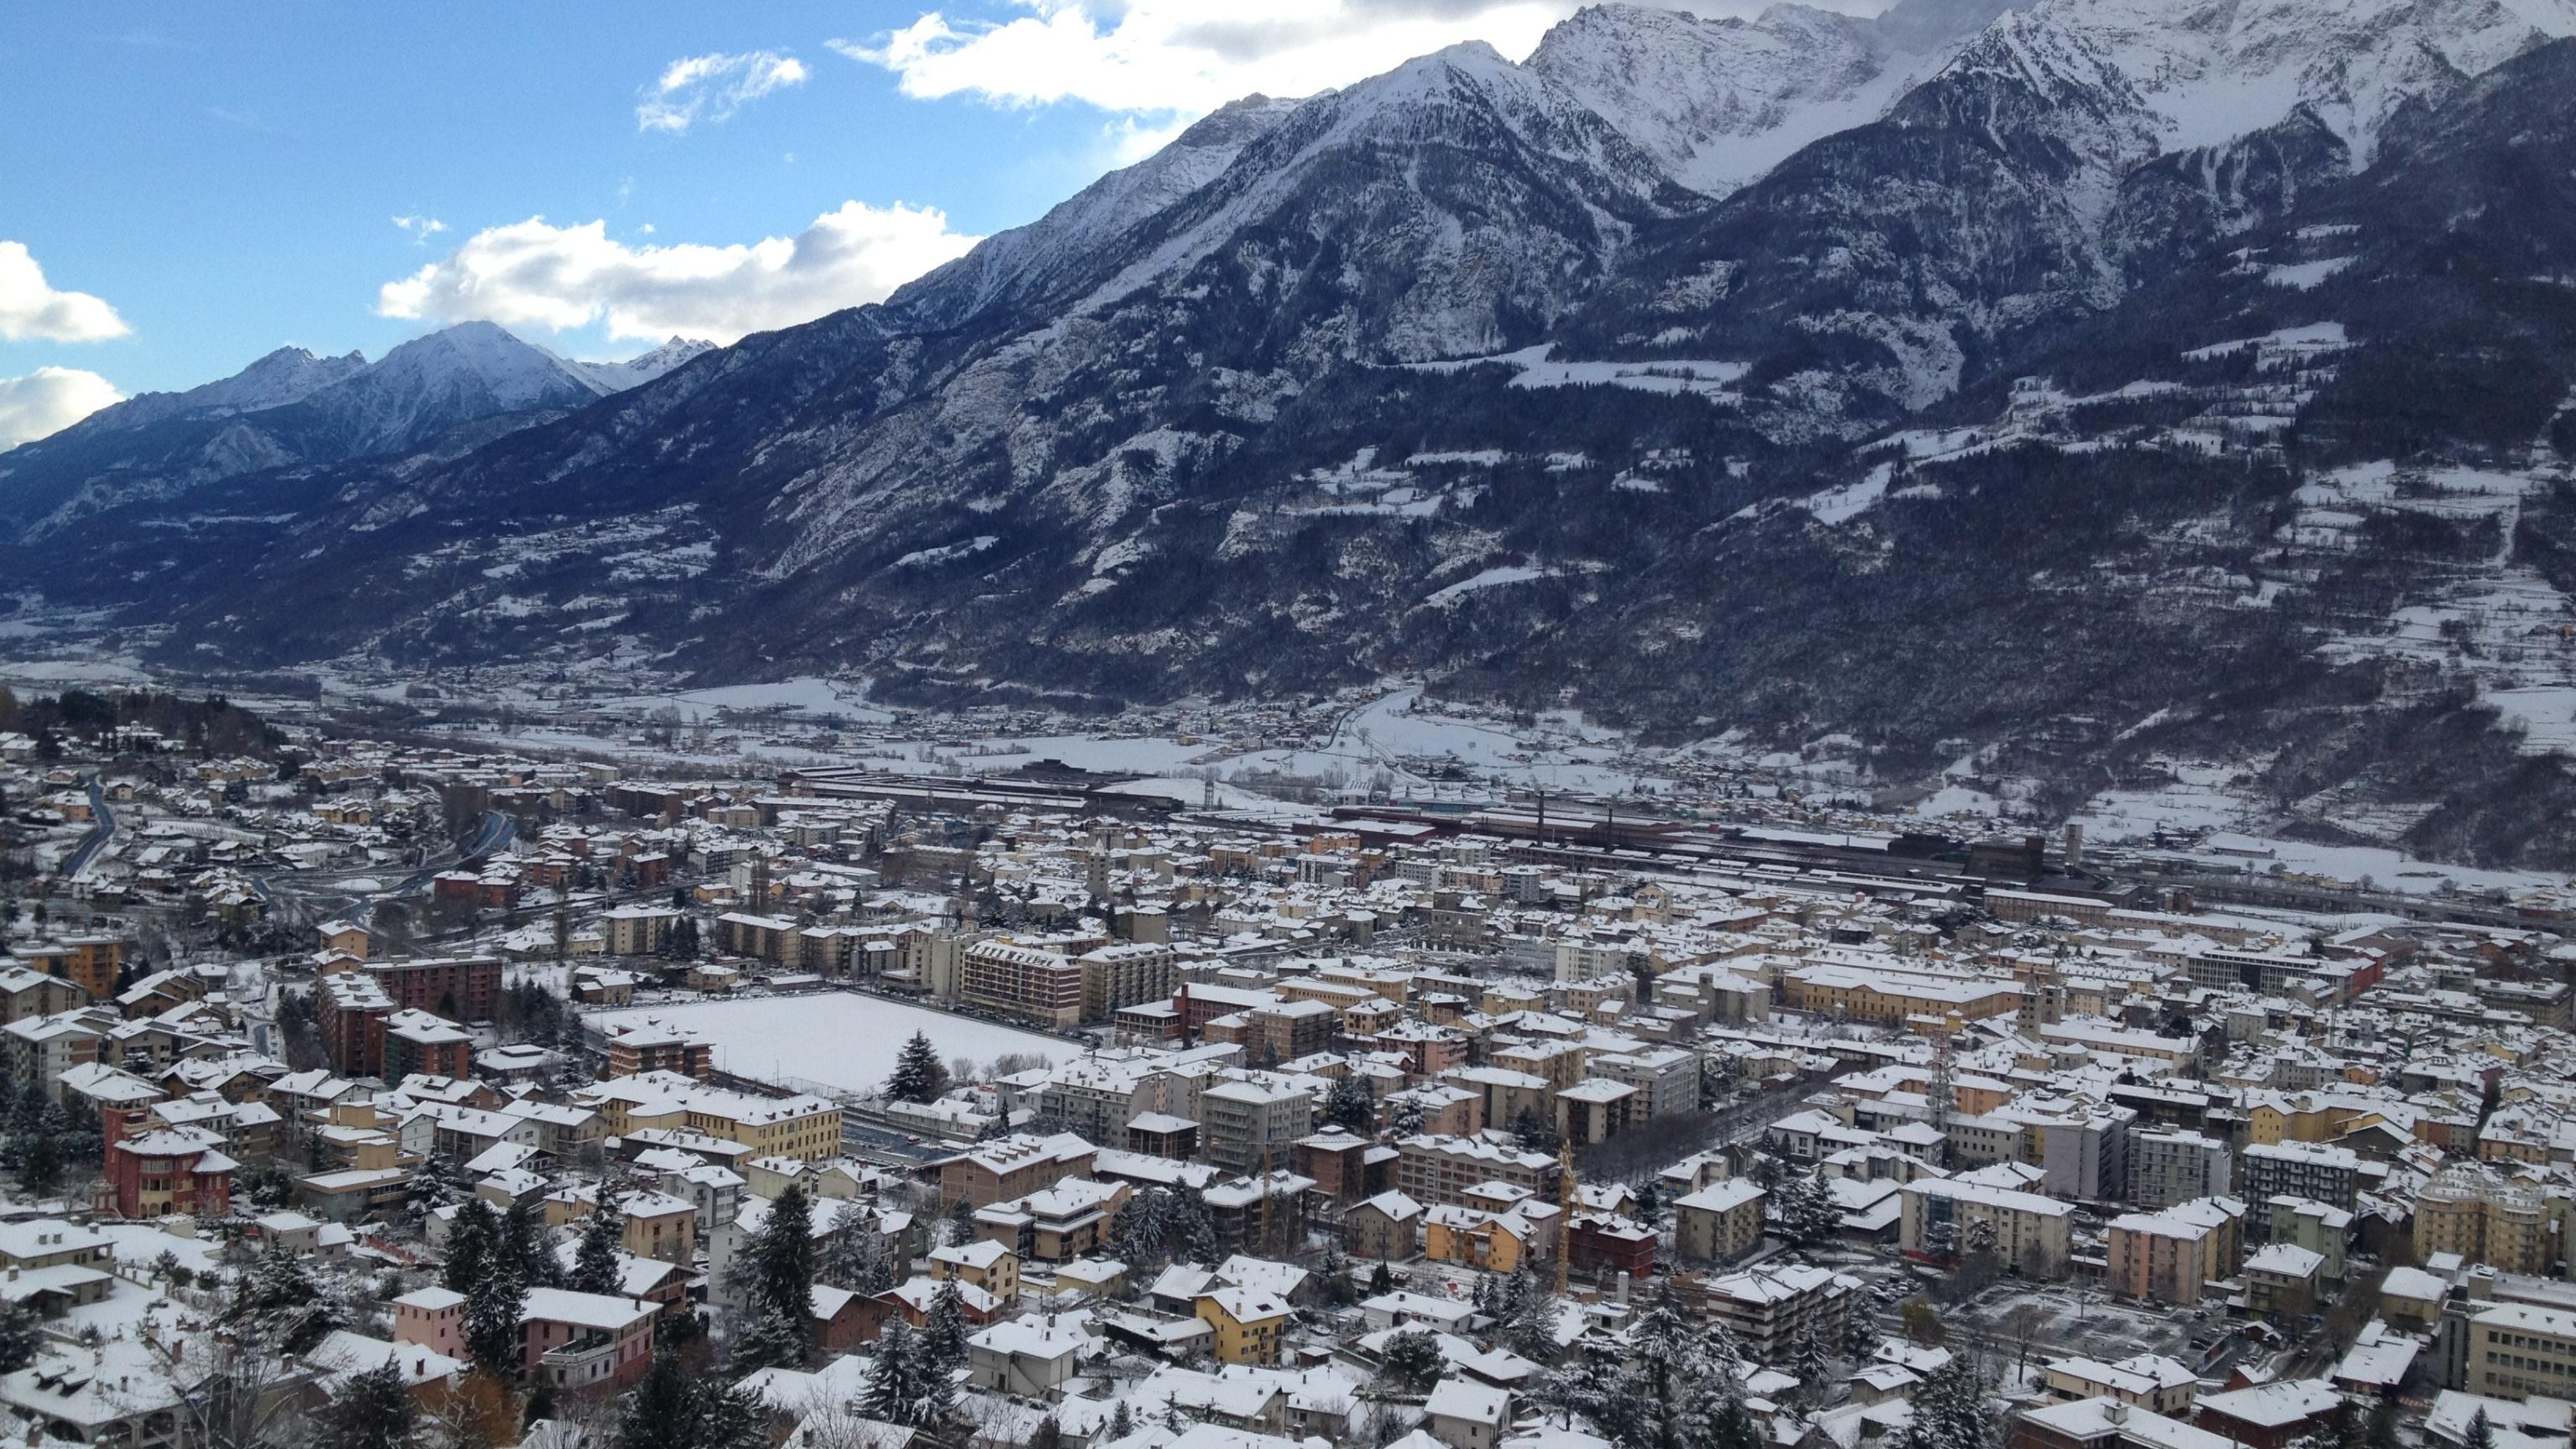 Maltempo, neve in Valle d'Aosta